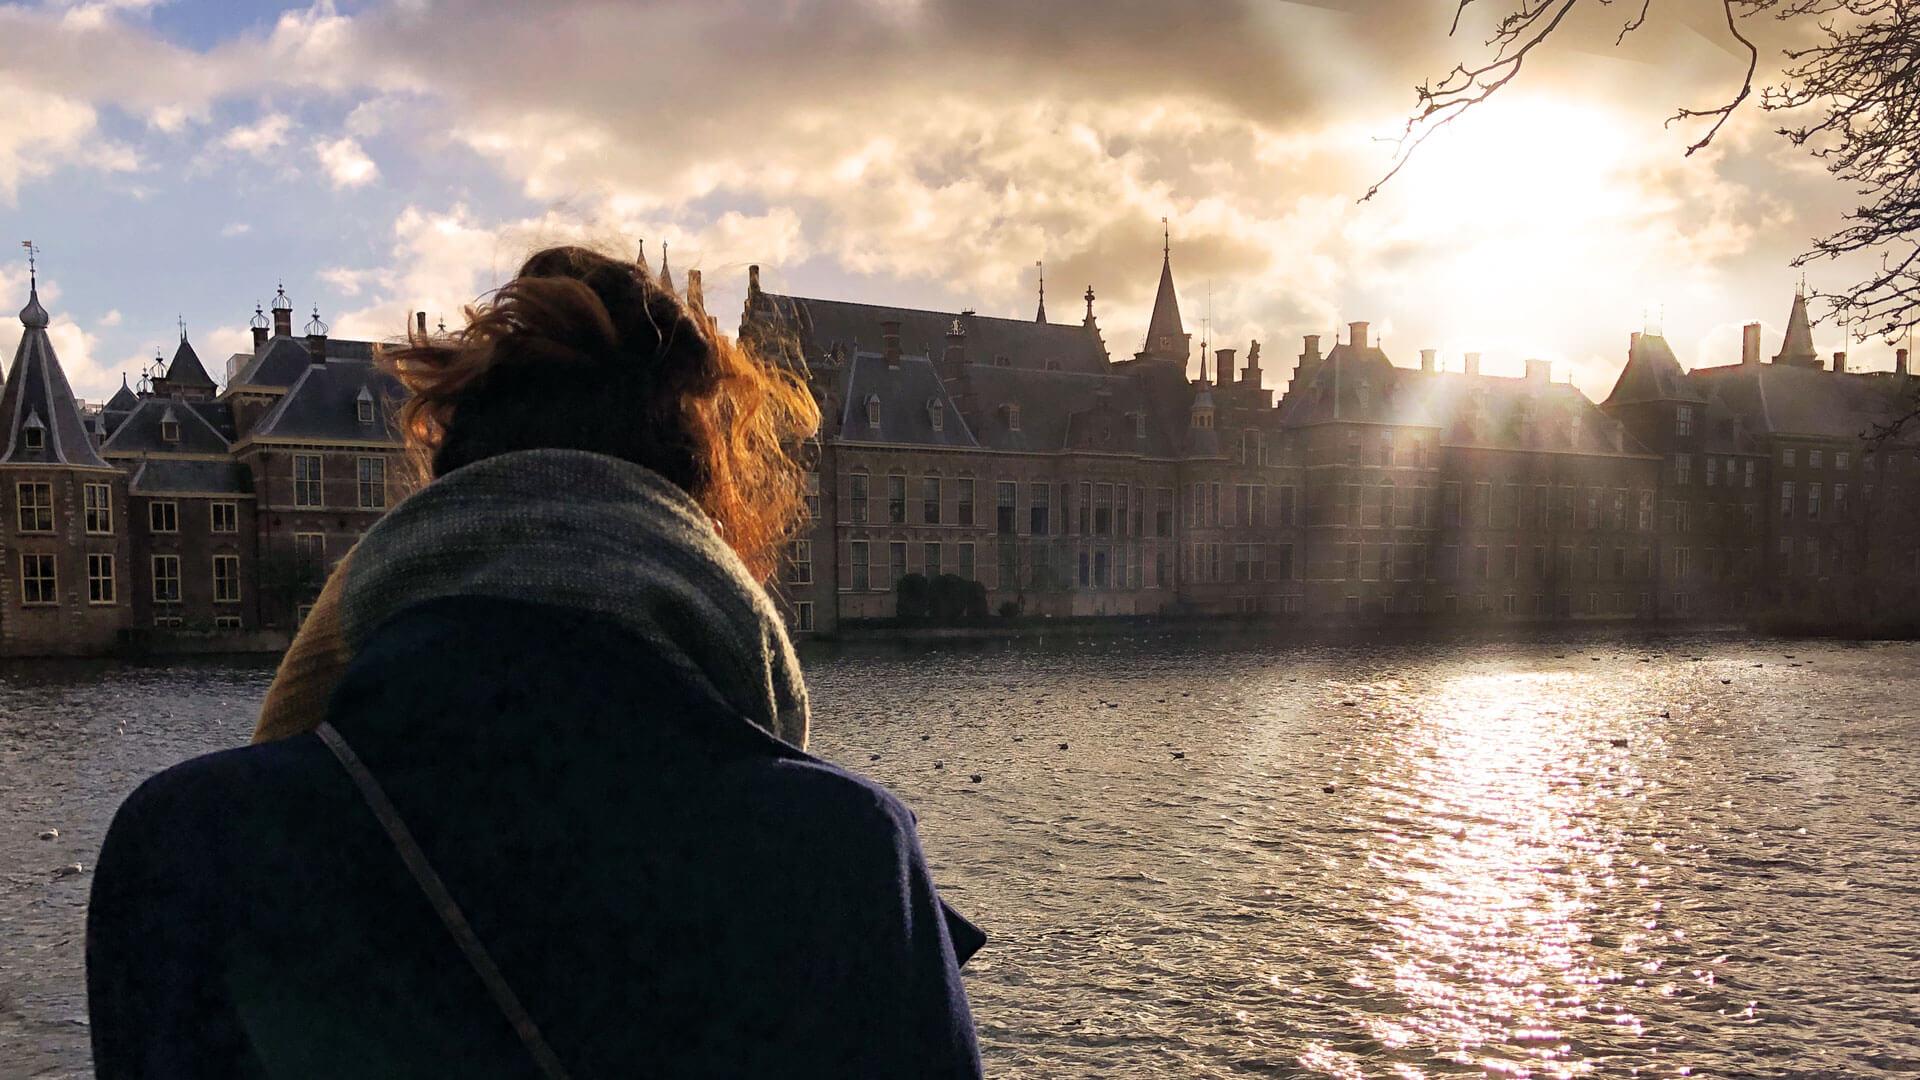 Binnenhof in Den Haag im Sonnenuntergang